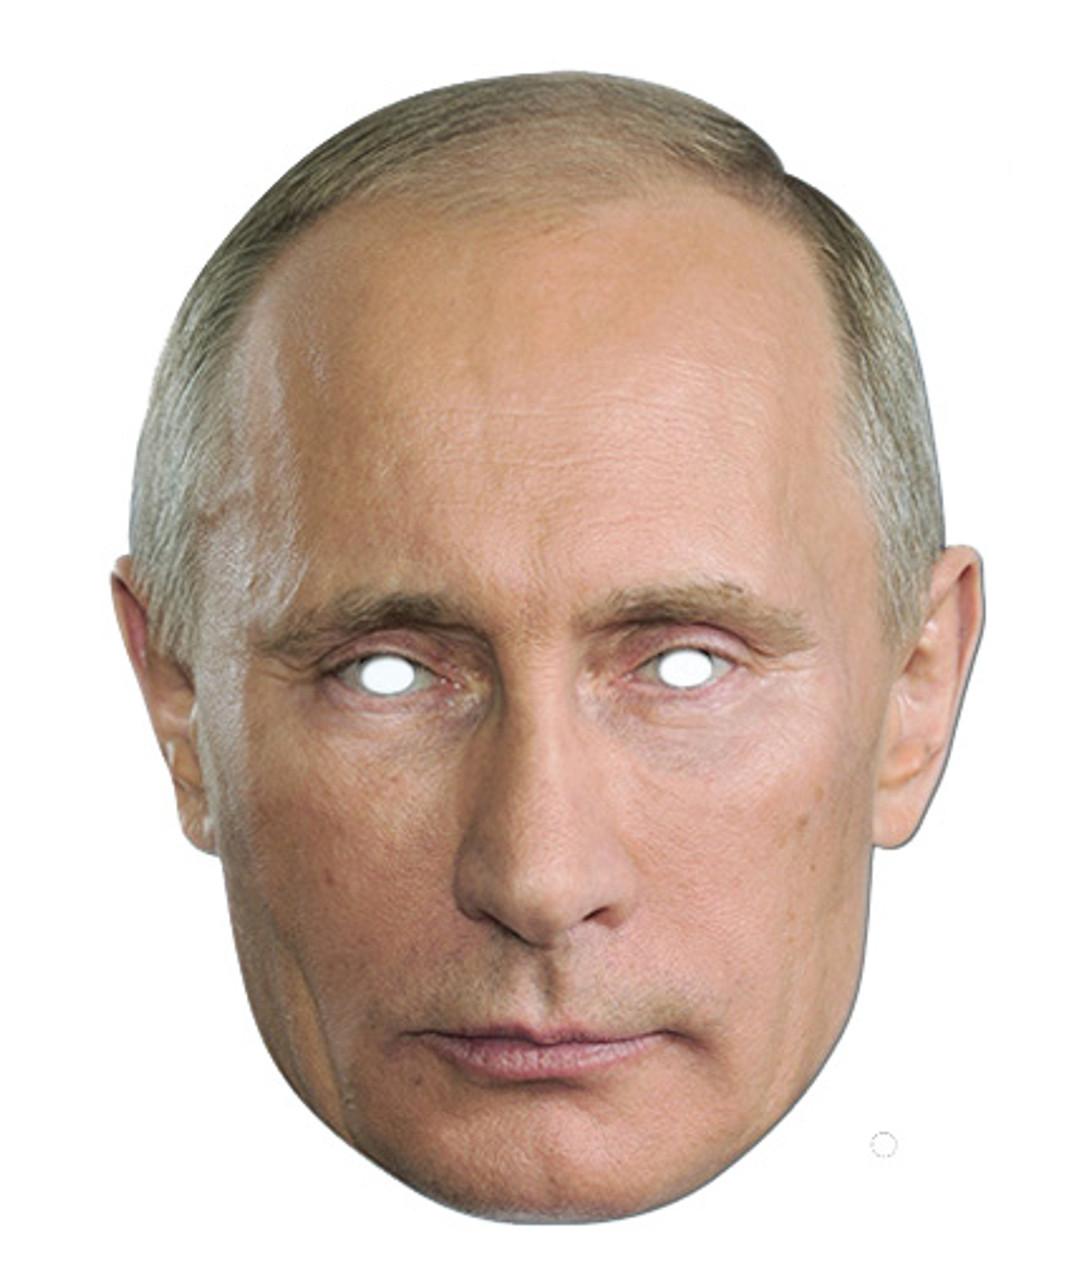 USA President Donald Trump 2D Card Party Face Mask Fancy Dress Up Politician